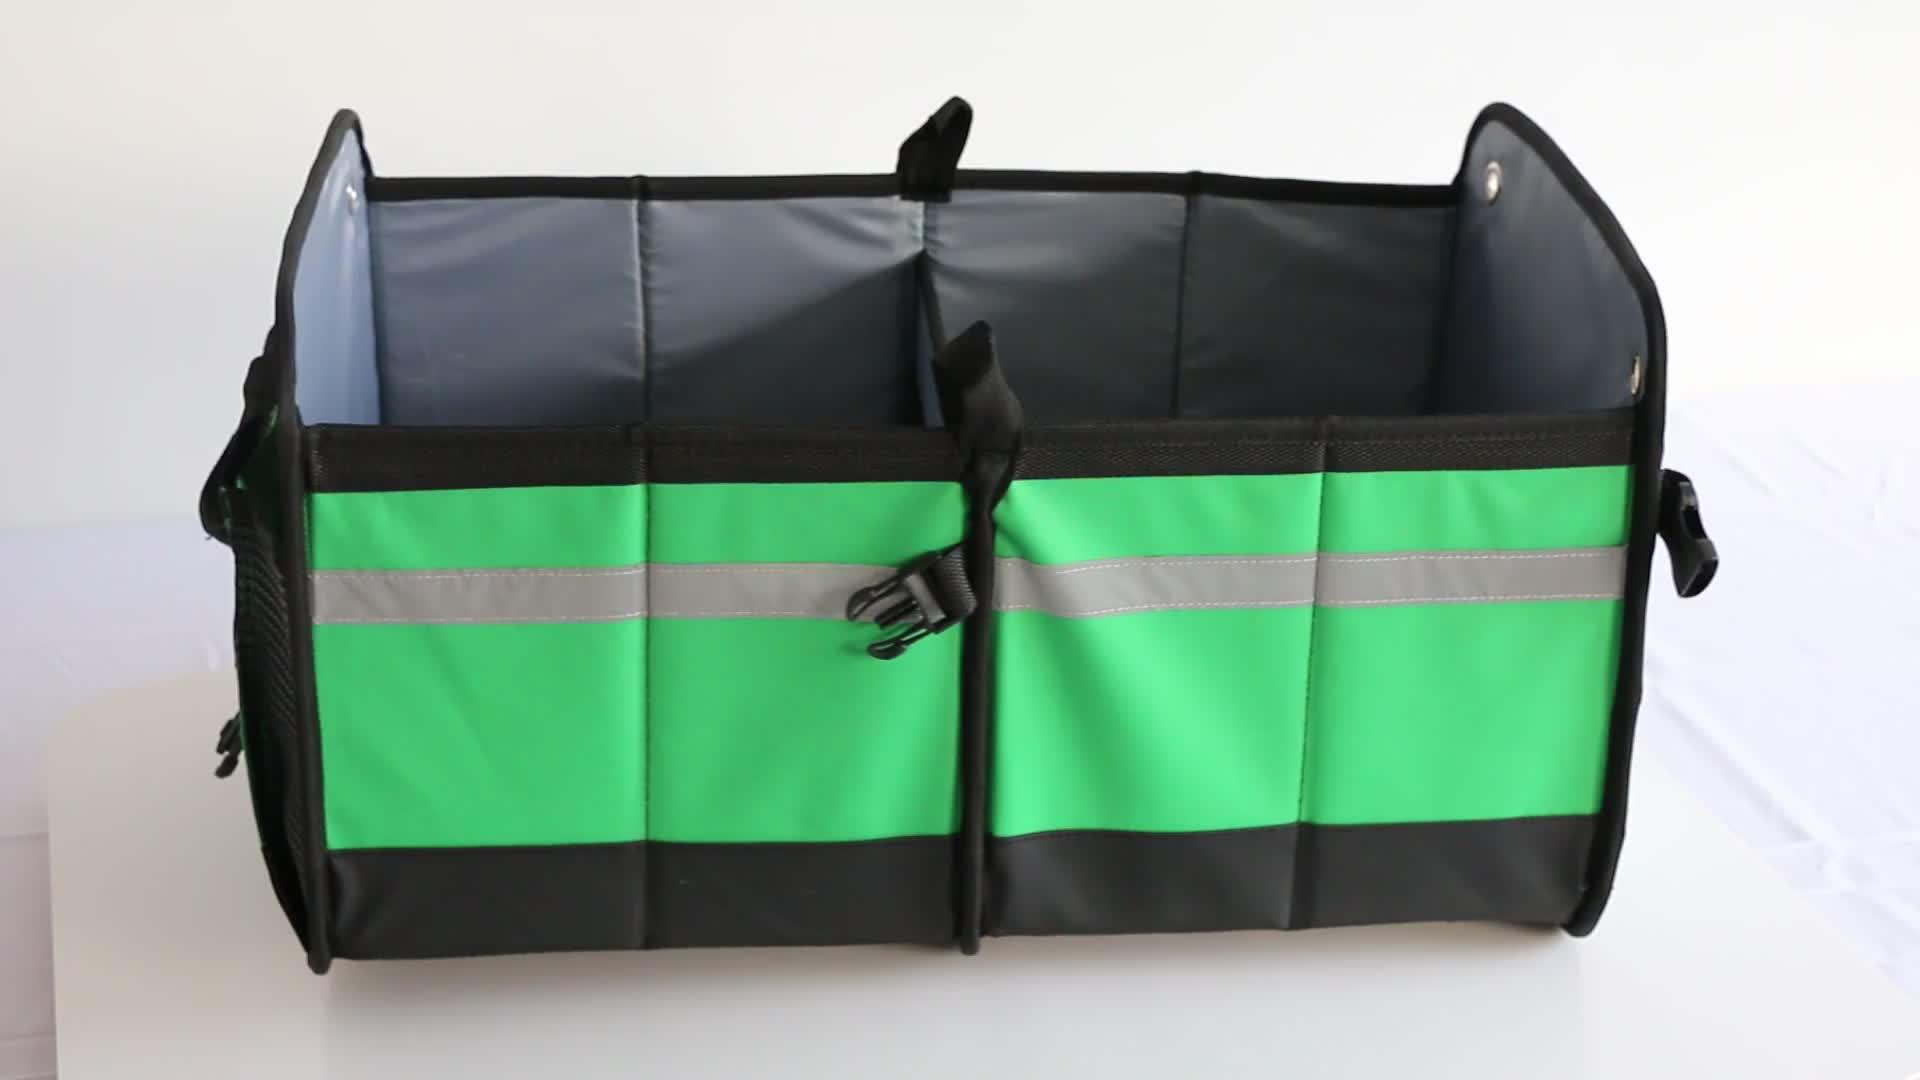 Collapsible Senior Cargo Storage Container Trunk Cargo Organizer Folding Auto Car Trunk